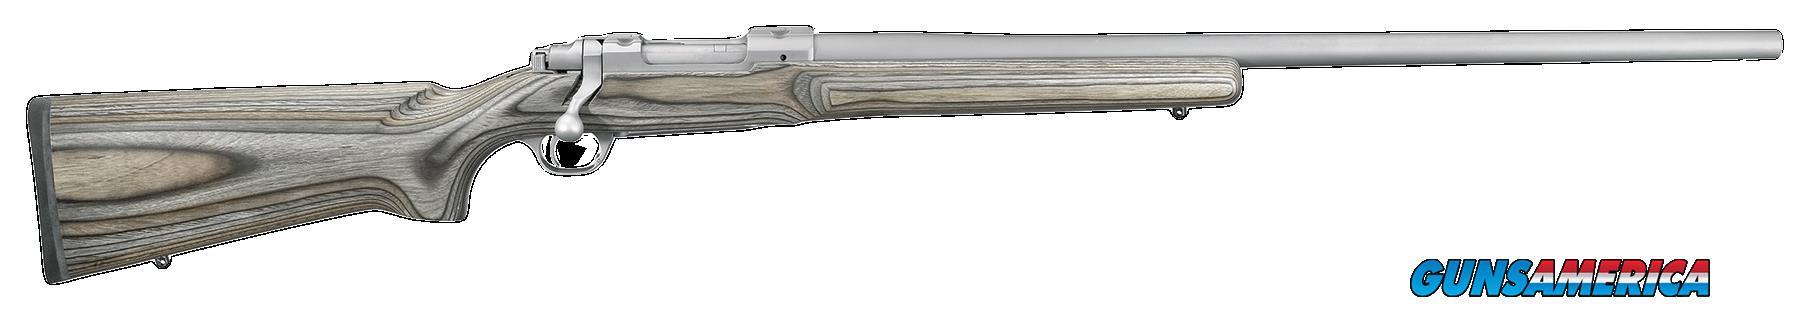 Ruger Hawkeye, Rug 17979 Hawkeye Var Trgt 308  Guns > Pistols > 1911 Pistol Copies (non-Colt)